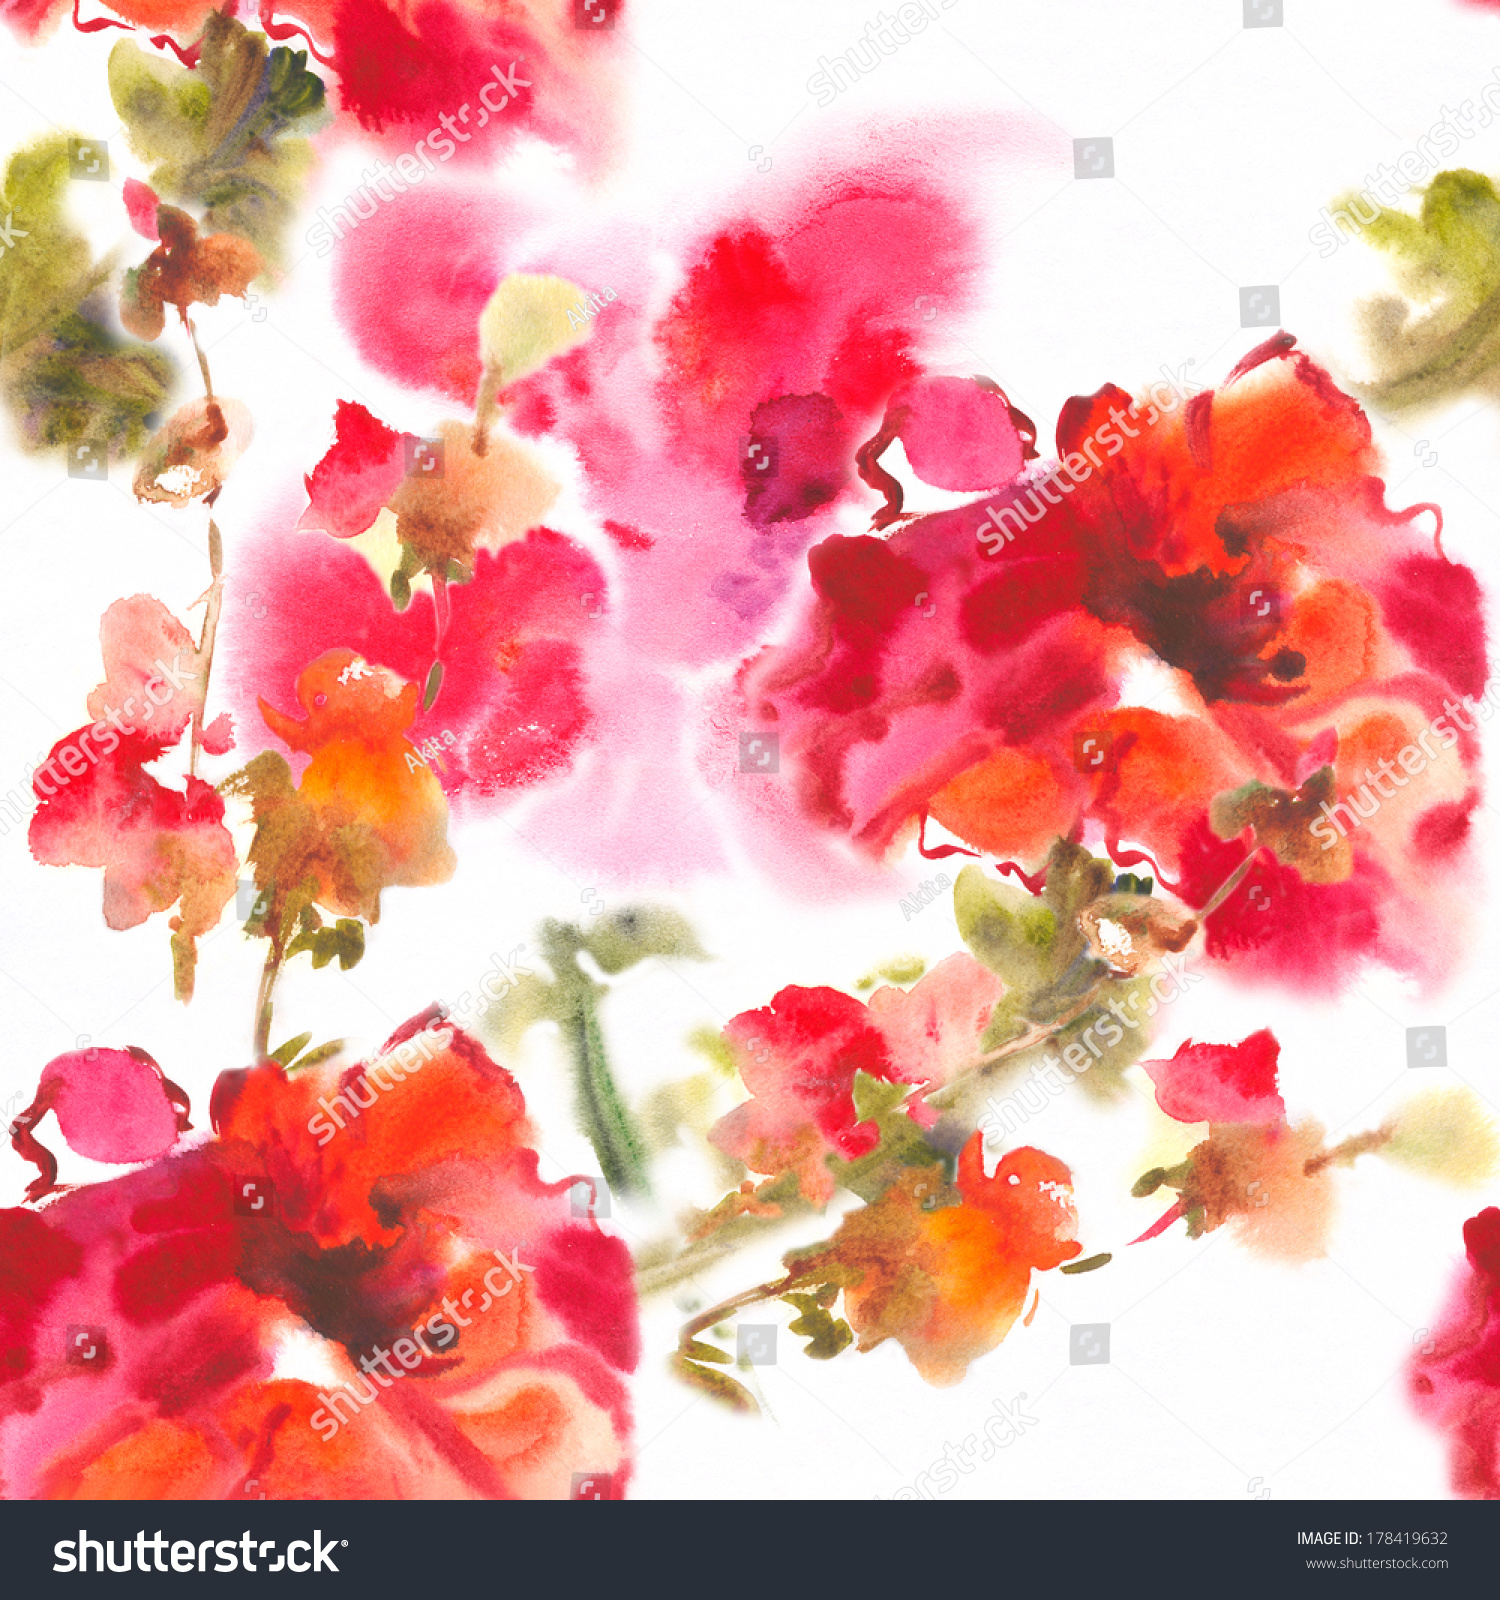 Color Illustration Flowers Watercolor Paintings Album Stock ...